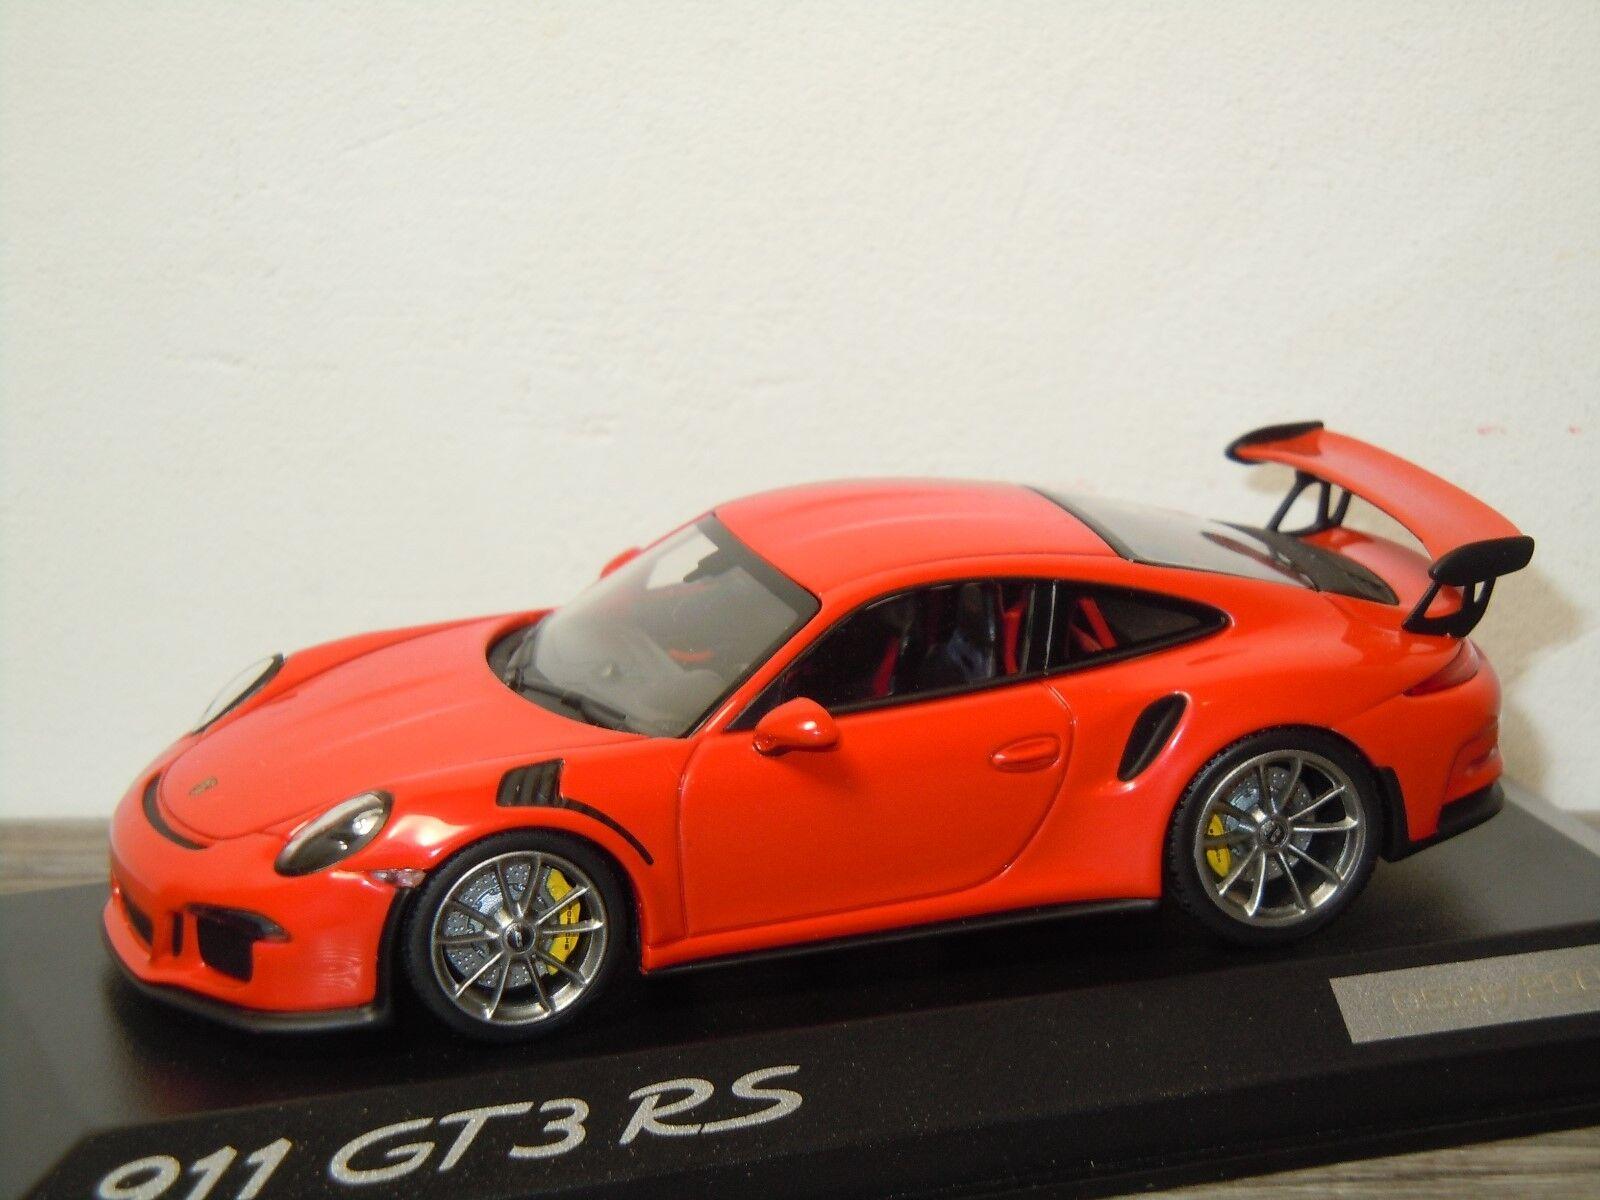 Porsche 911 991 GT3 RS Lava orange - Minichamps 1 43 in Box 30606